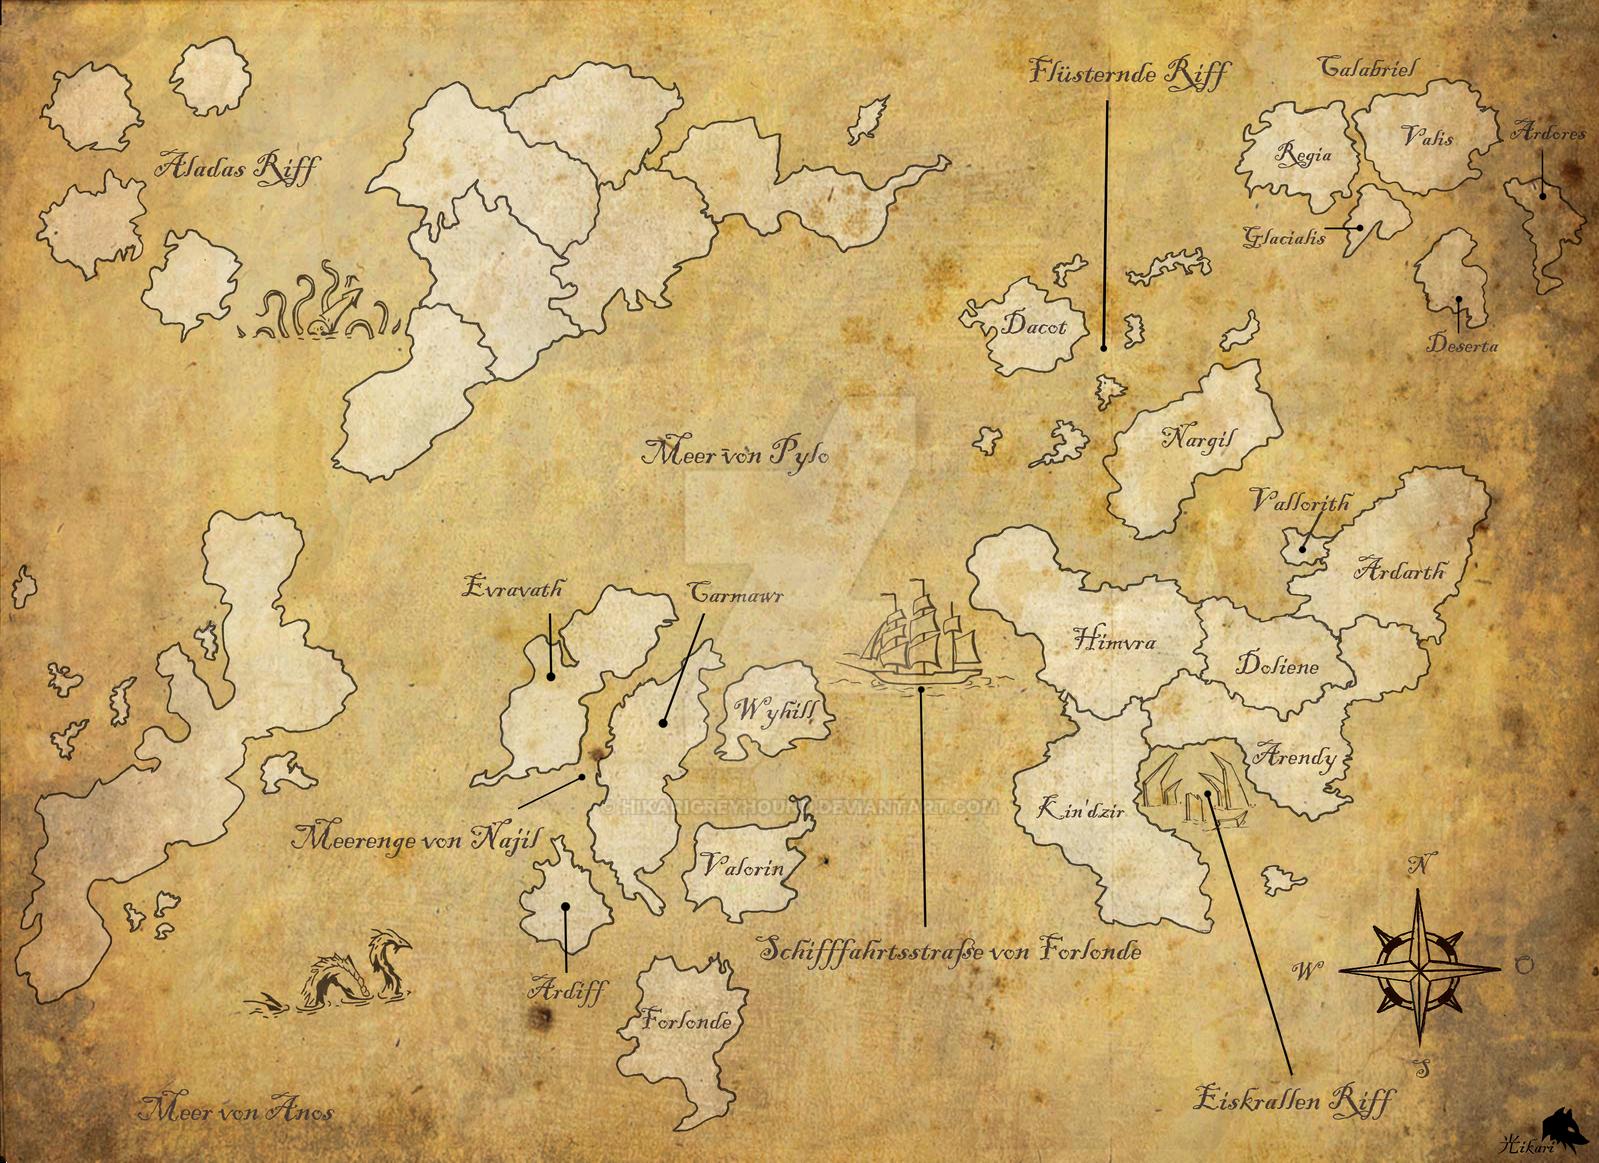 Geographie Llandy_by_hikarigreyhound-dc9ilgs